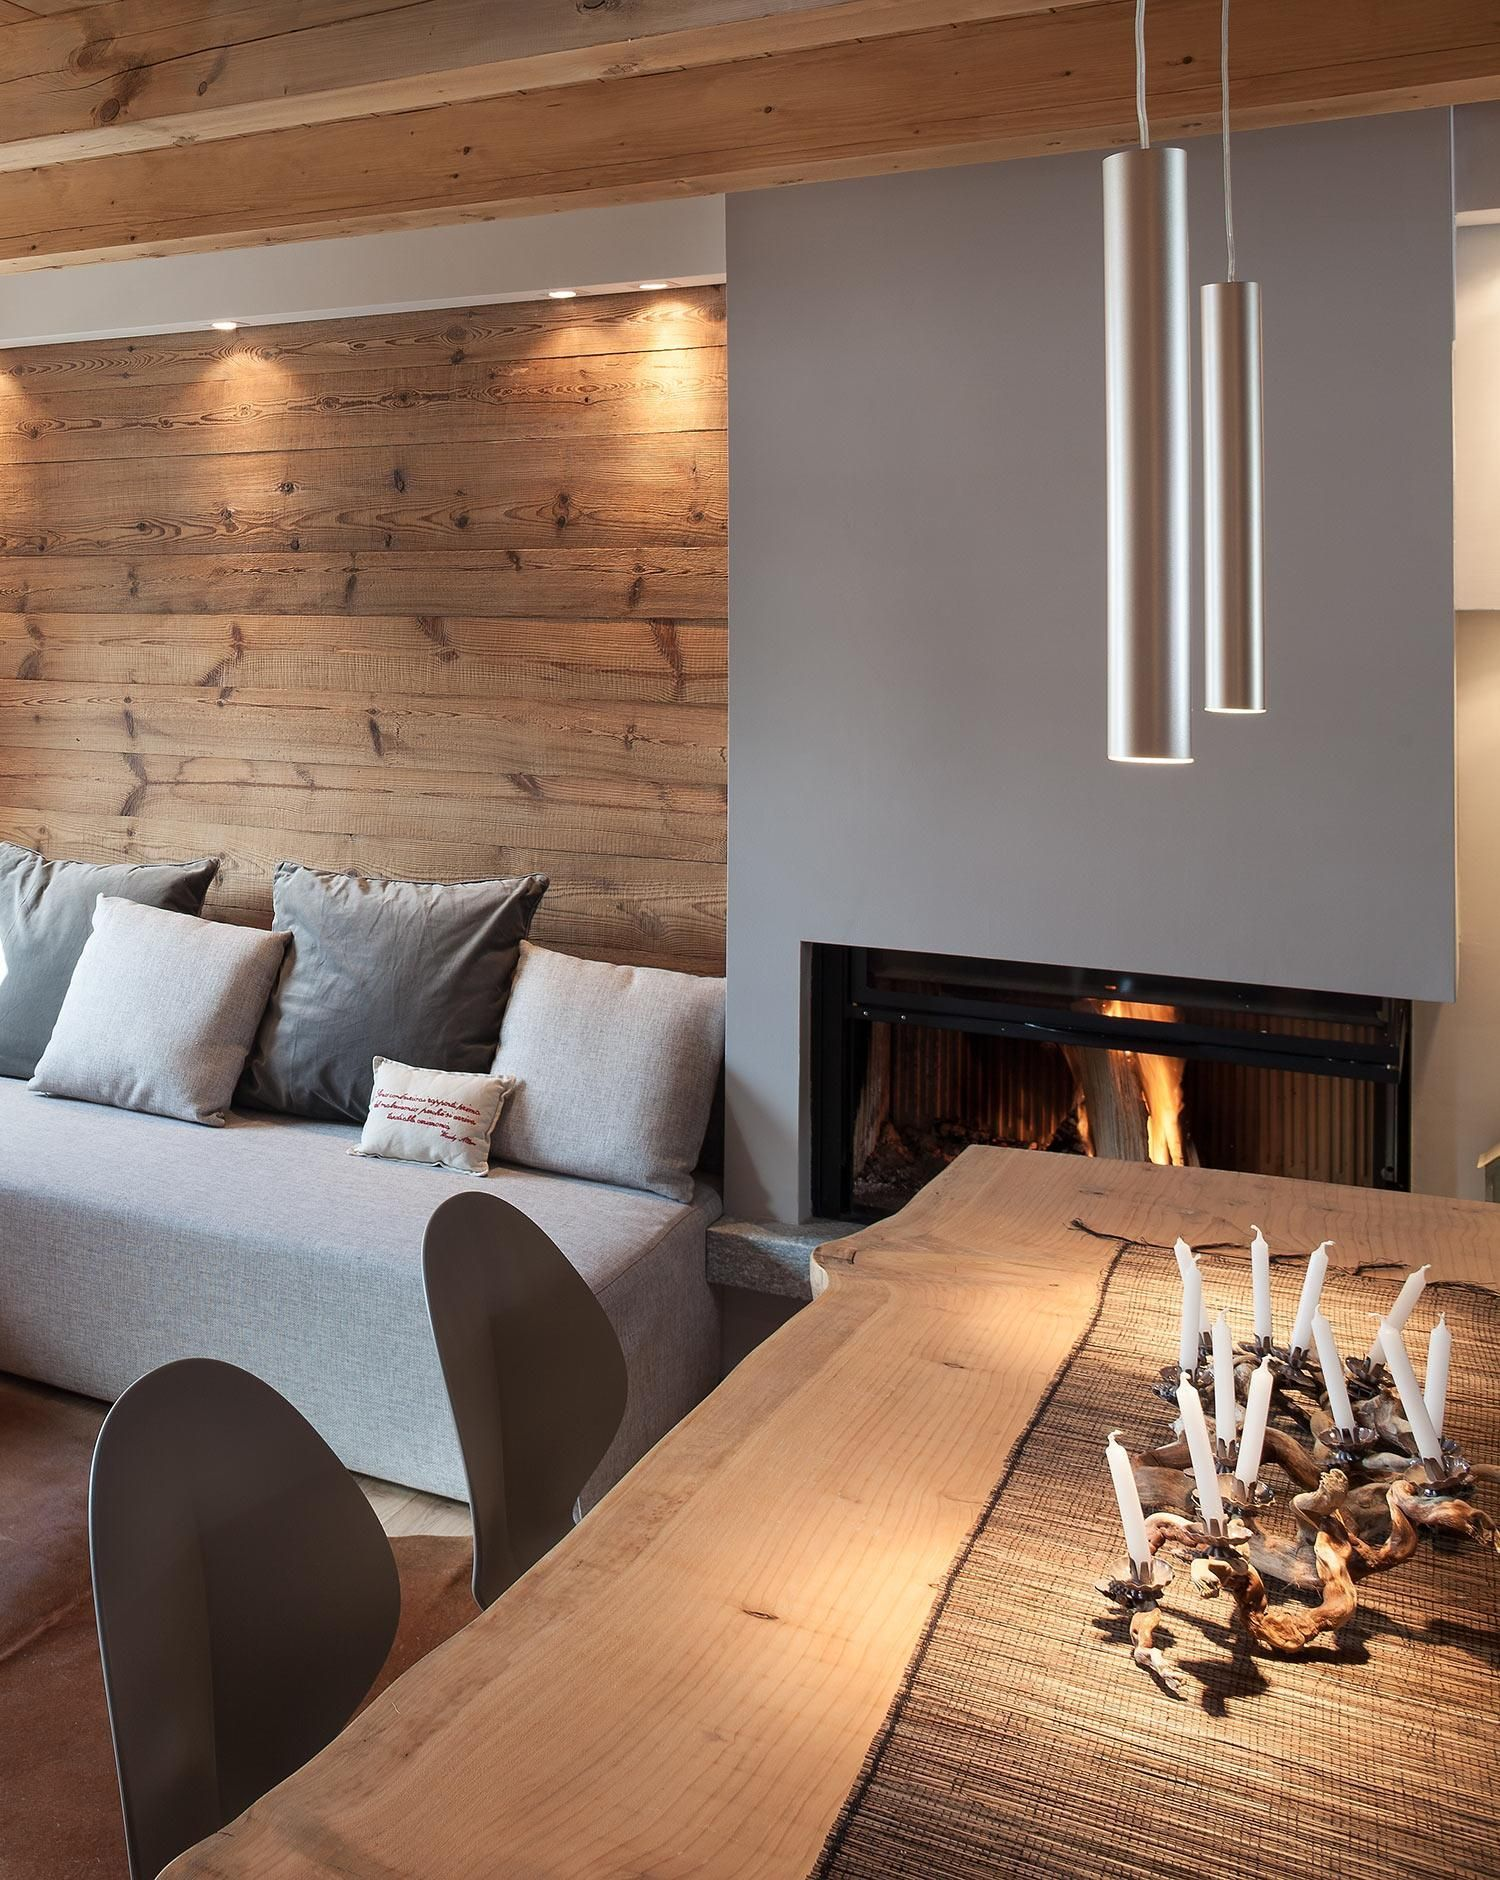 Photo of Chalet di Design Aosta Stile Rustico Montagna   WESTWING MAGAZINE #haus innenarc…